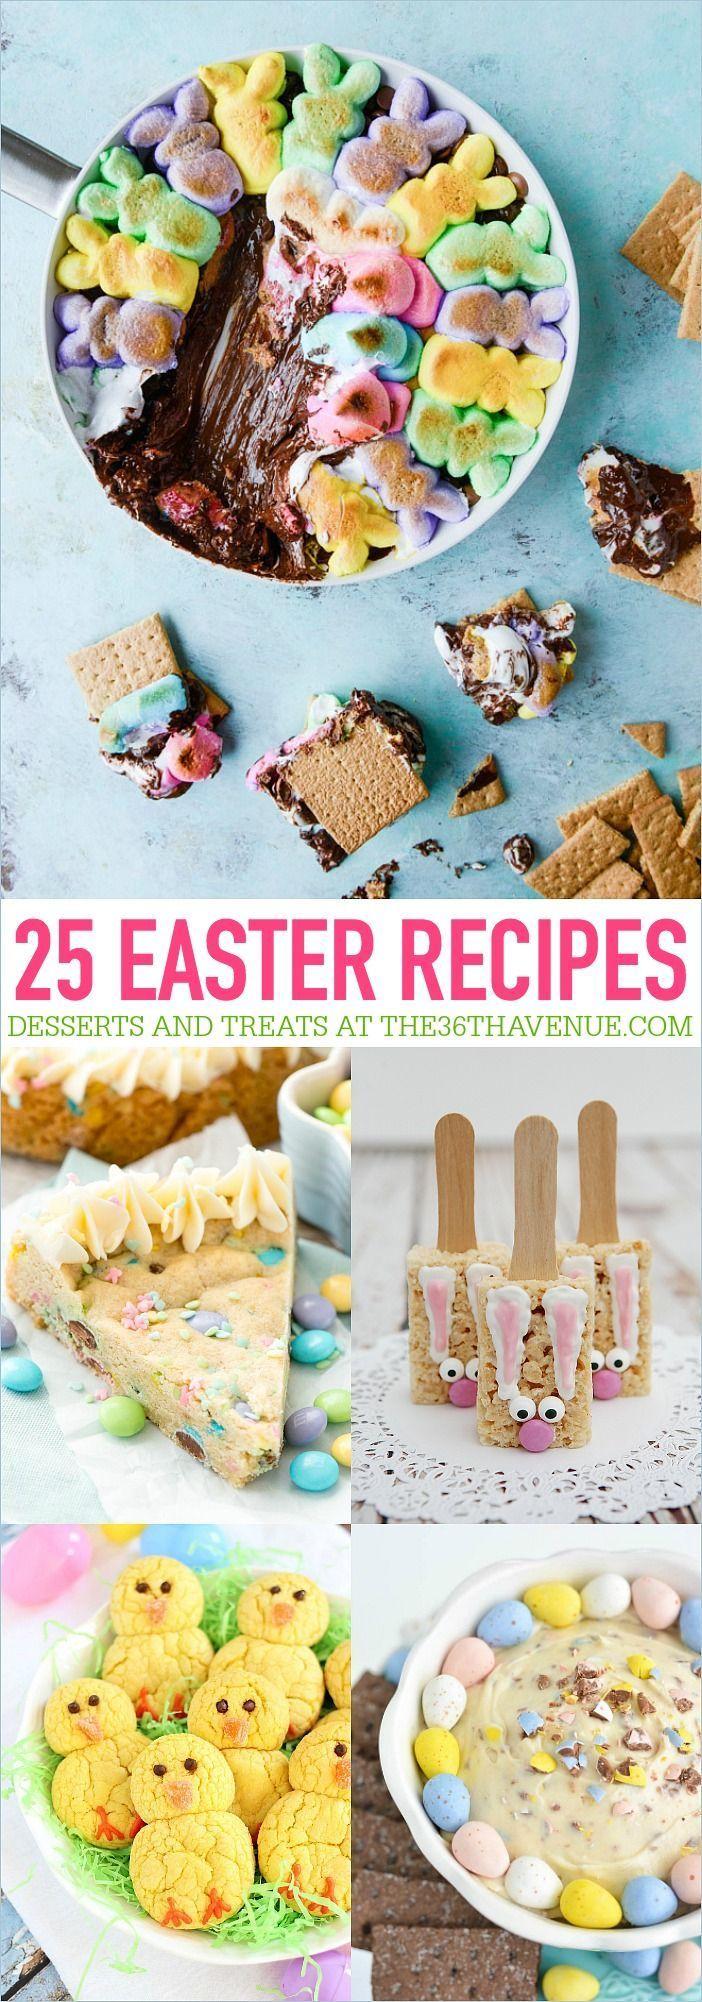 Photo of Osterrezepte – Einfache und leckere Osterrezepte #AVENUE #die #Easter Recipes Id…